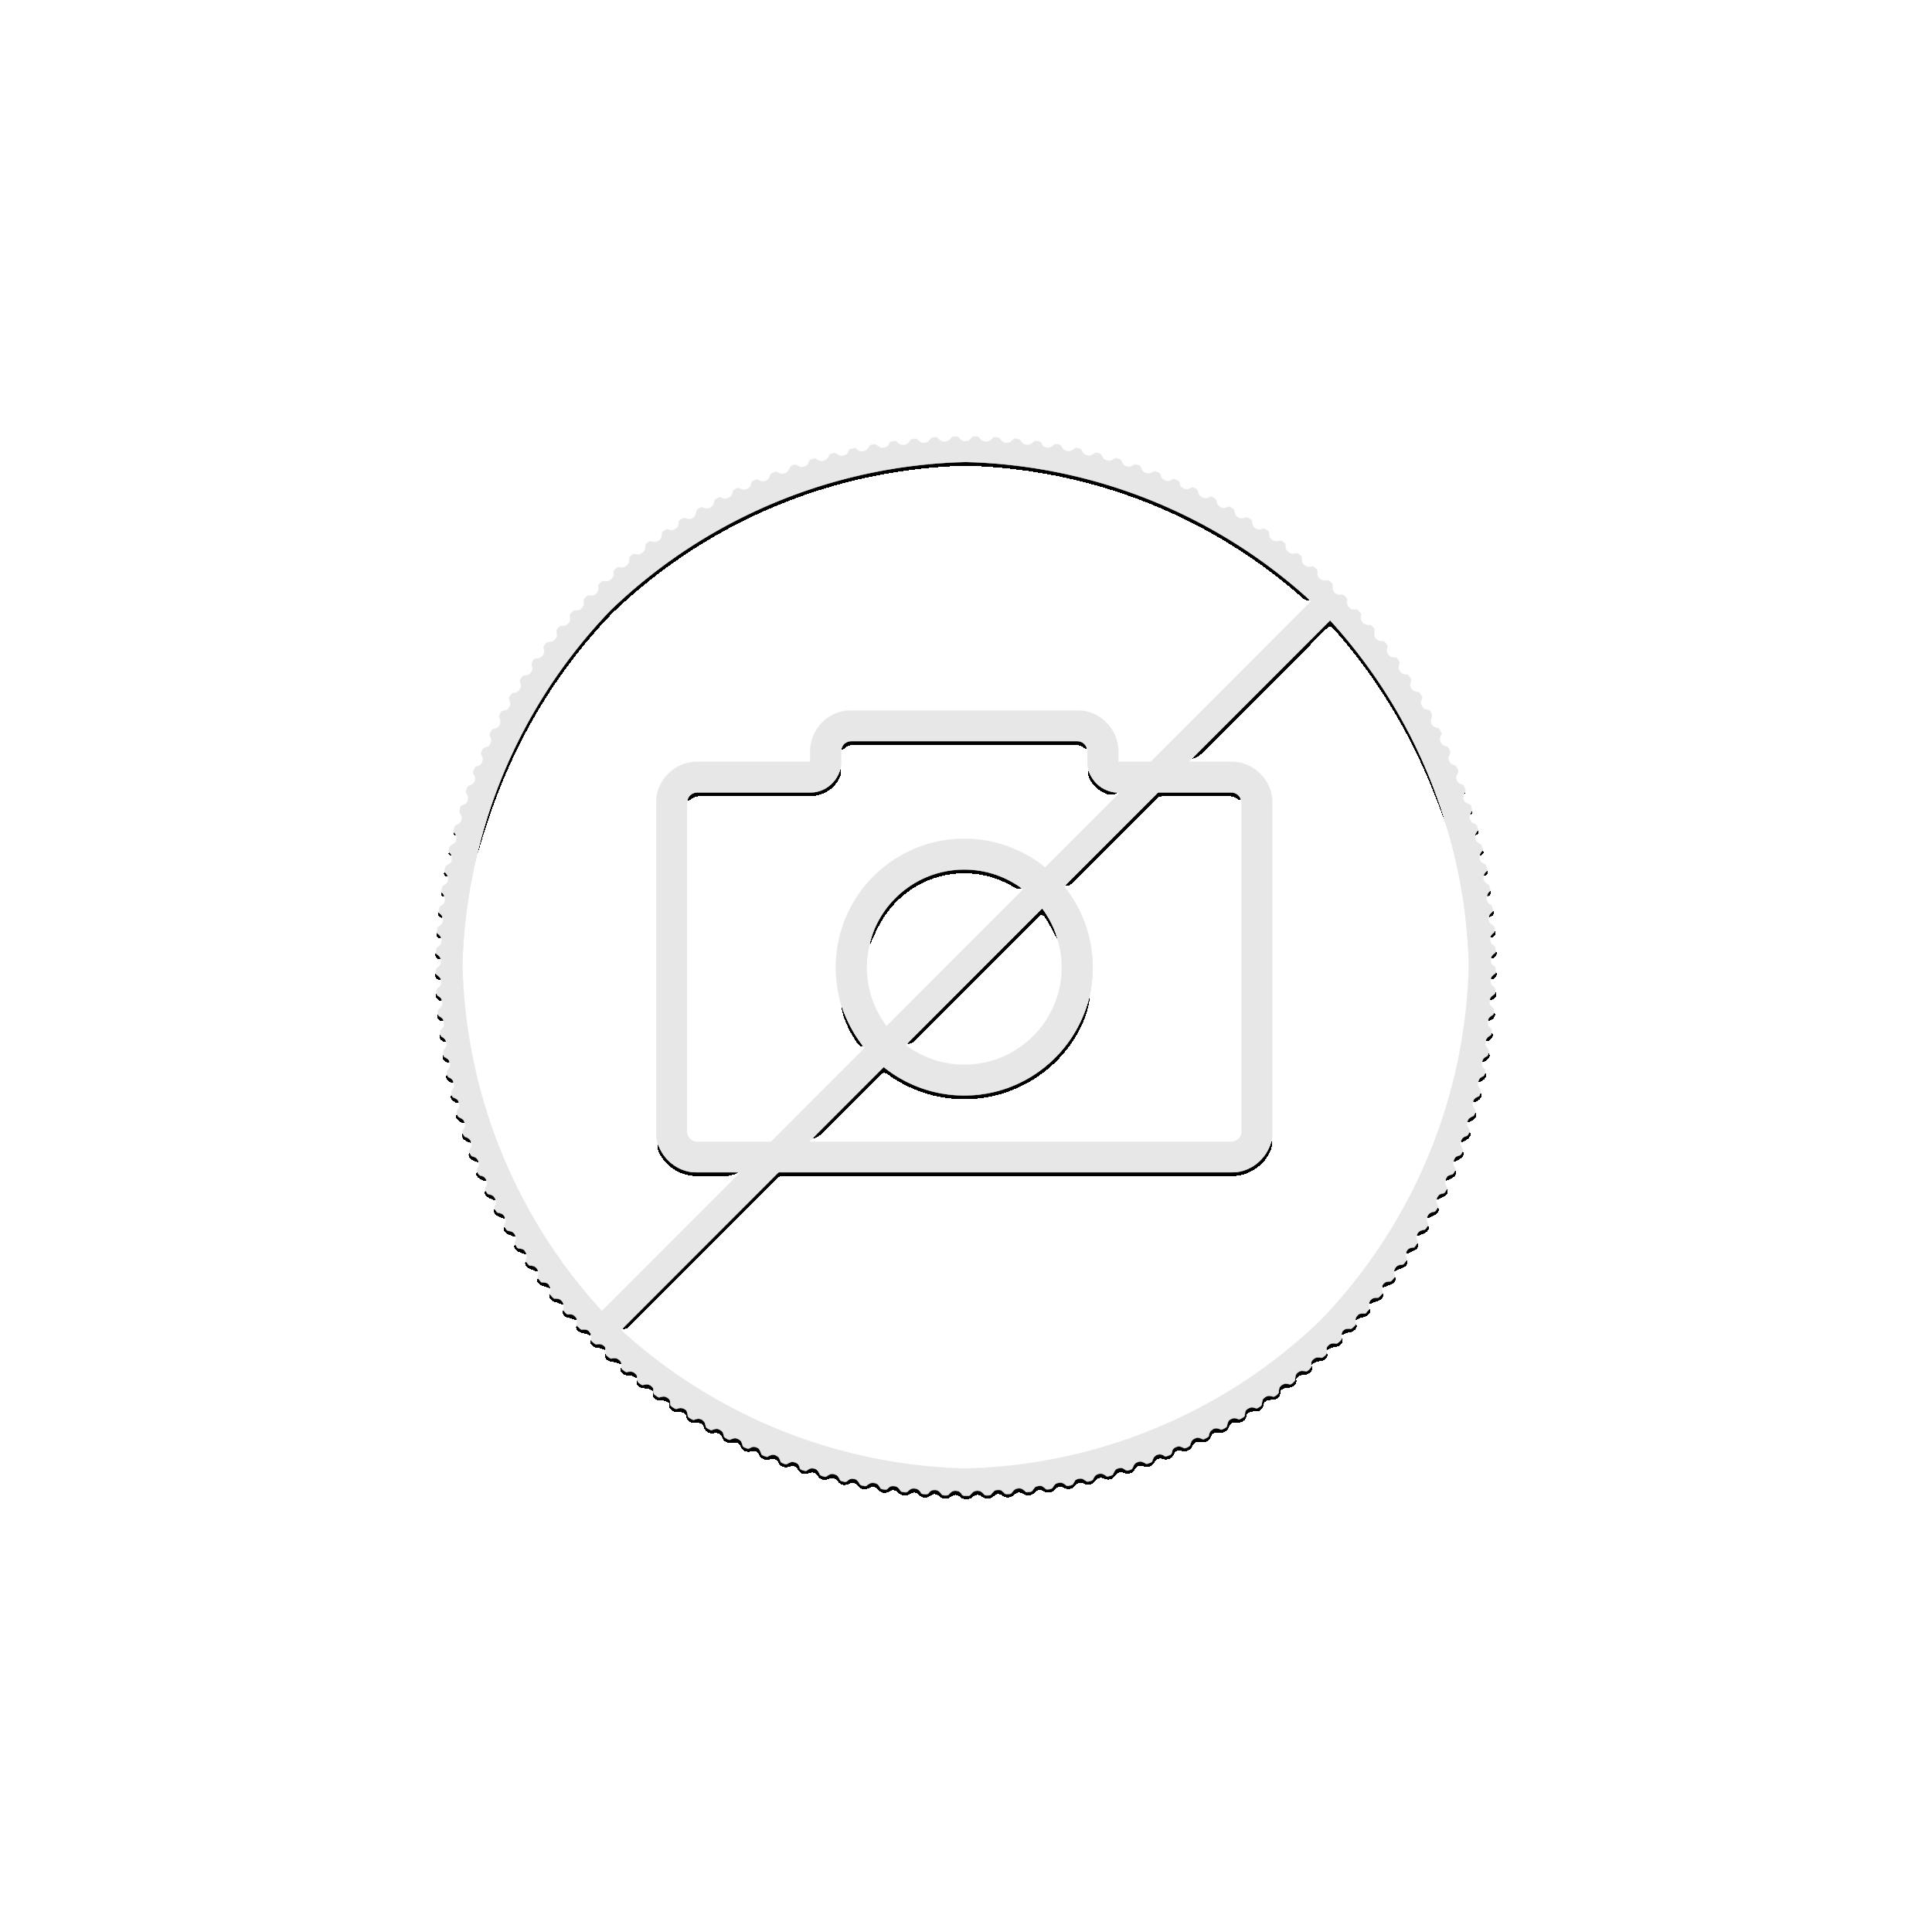 1 troy ounce zilveren munt Super incuse Maple Leaf 2021